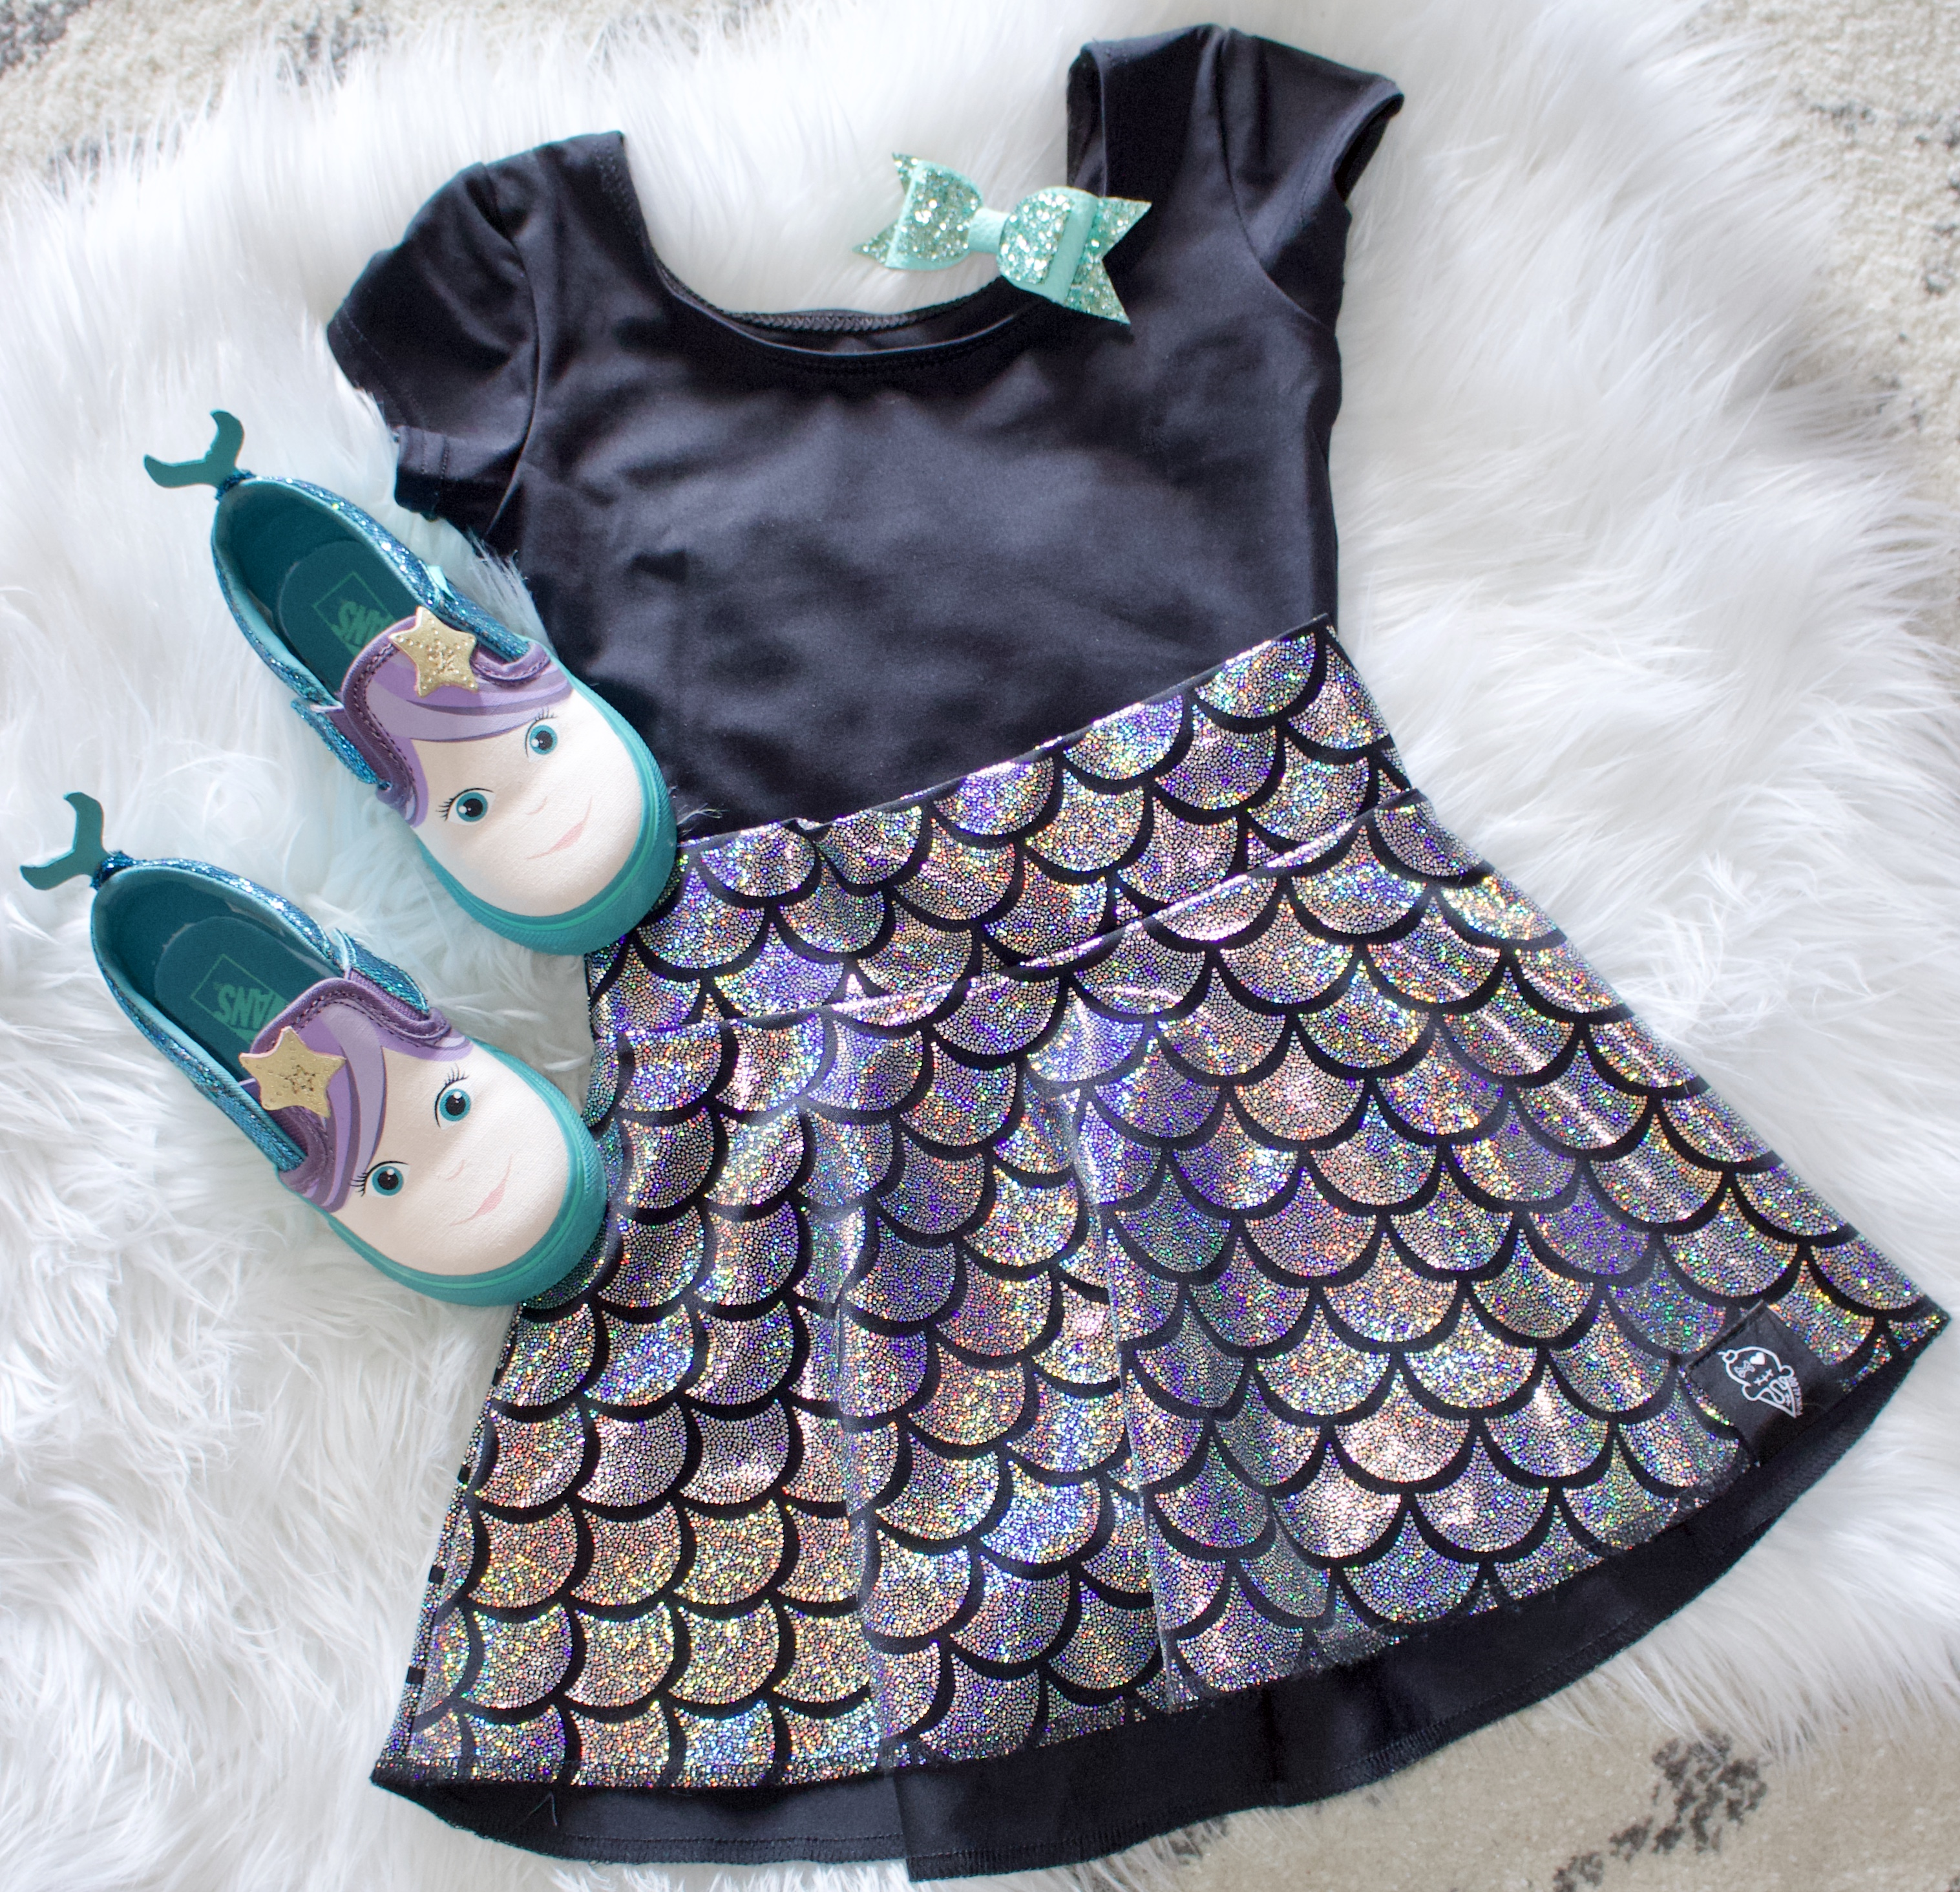 mermaid birthday party toddler outfit #birthdayparty #mermaidoutfit #kidsfashion #toddlerstyle